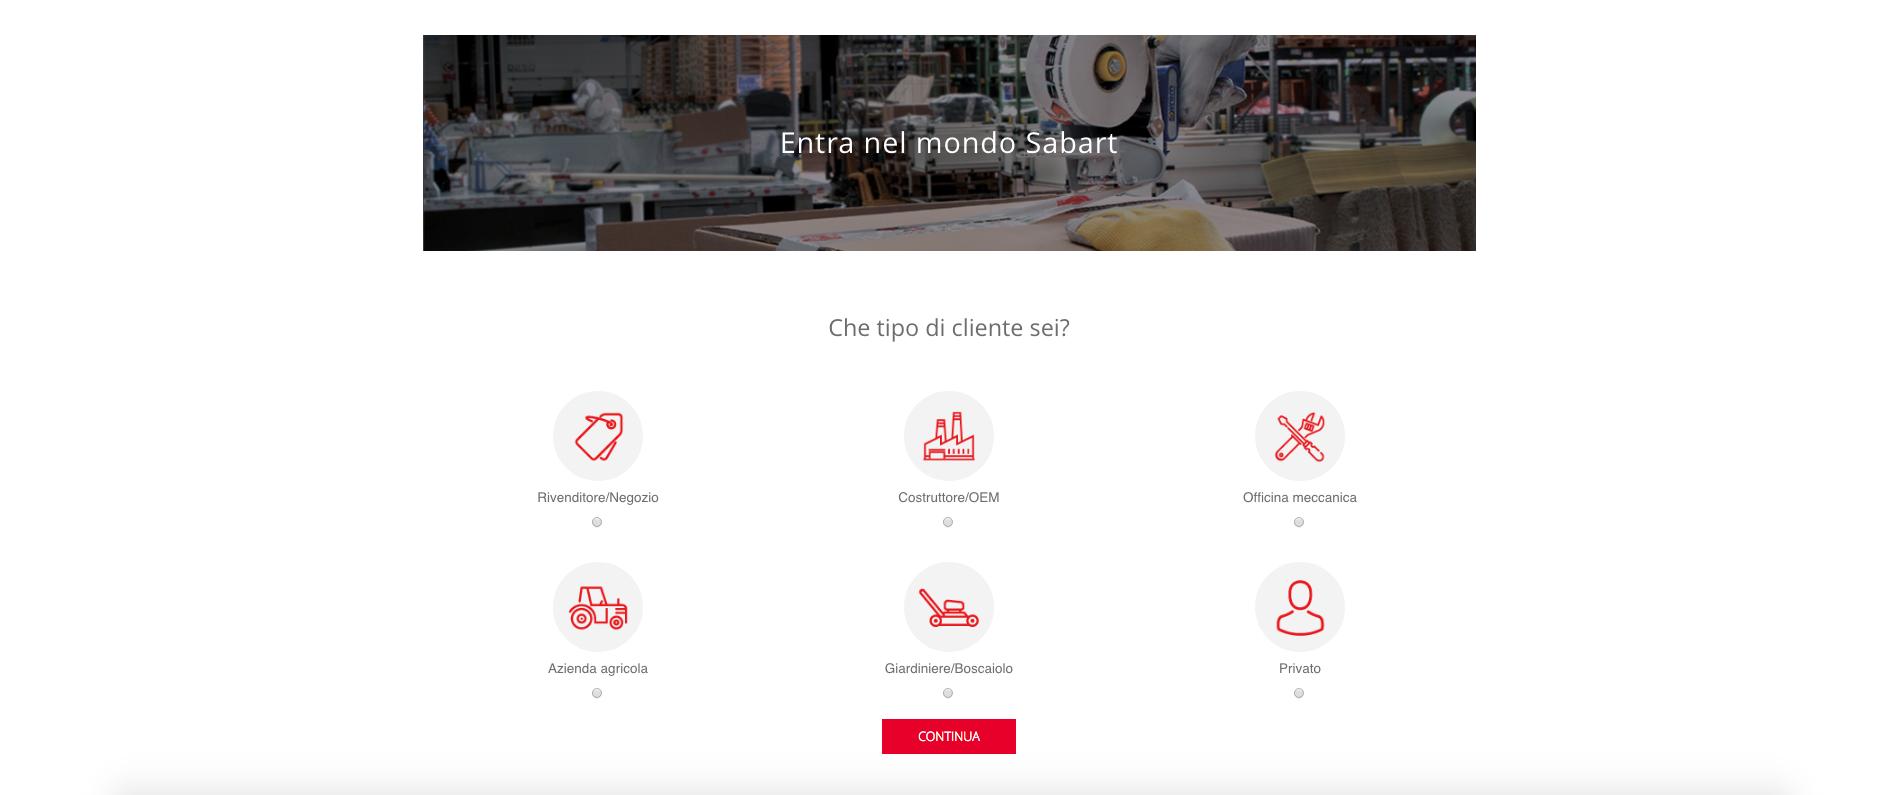 Nuovo sito Sabart